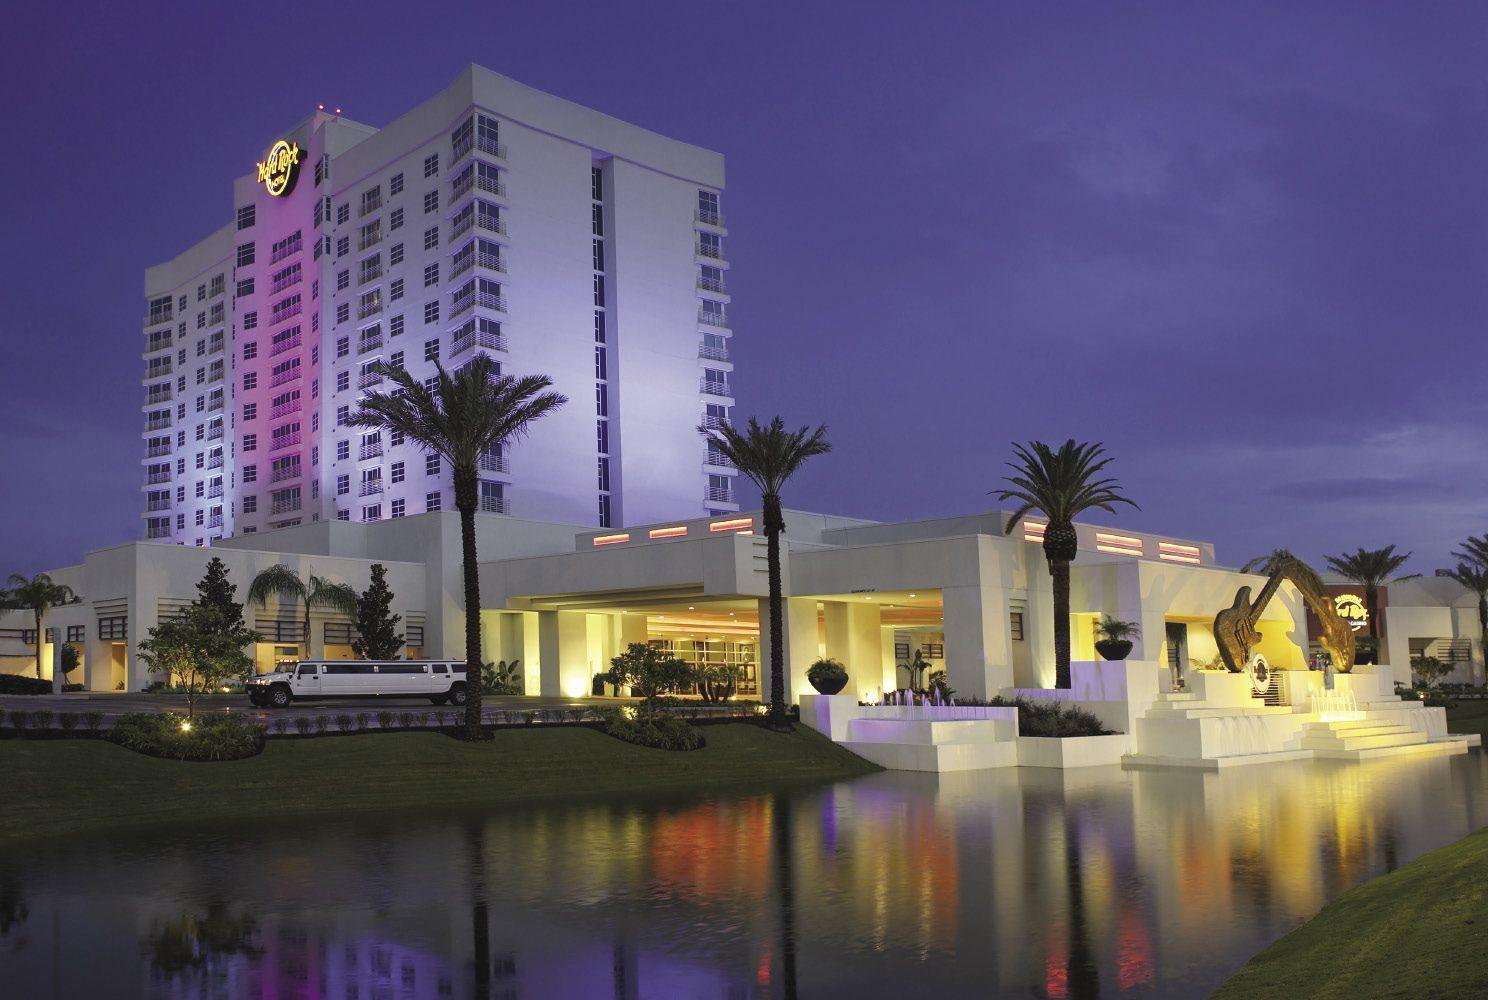 3f97d7e5c2543fb3744d812462060bd7 - Hotels In Miami Gardens Near Hard Rock Stadium